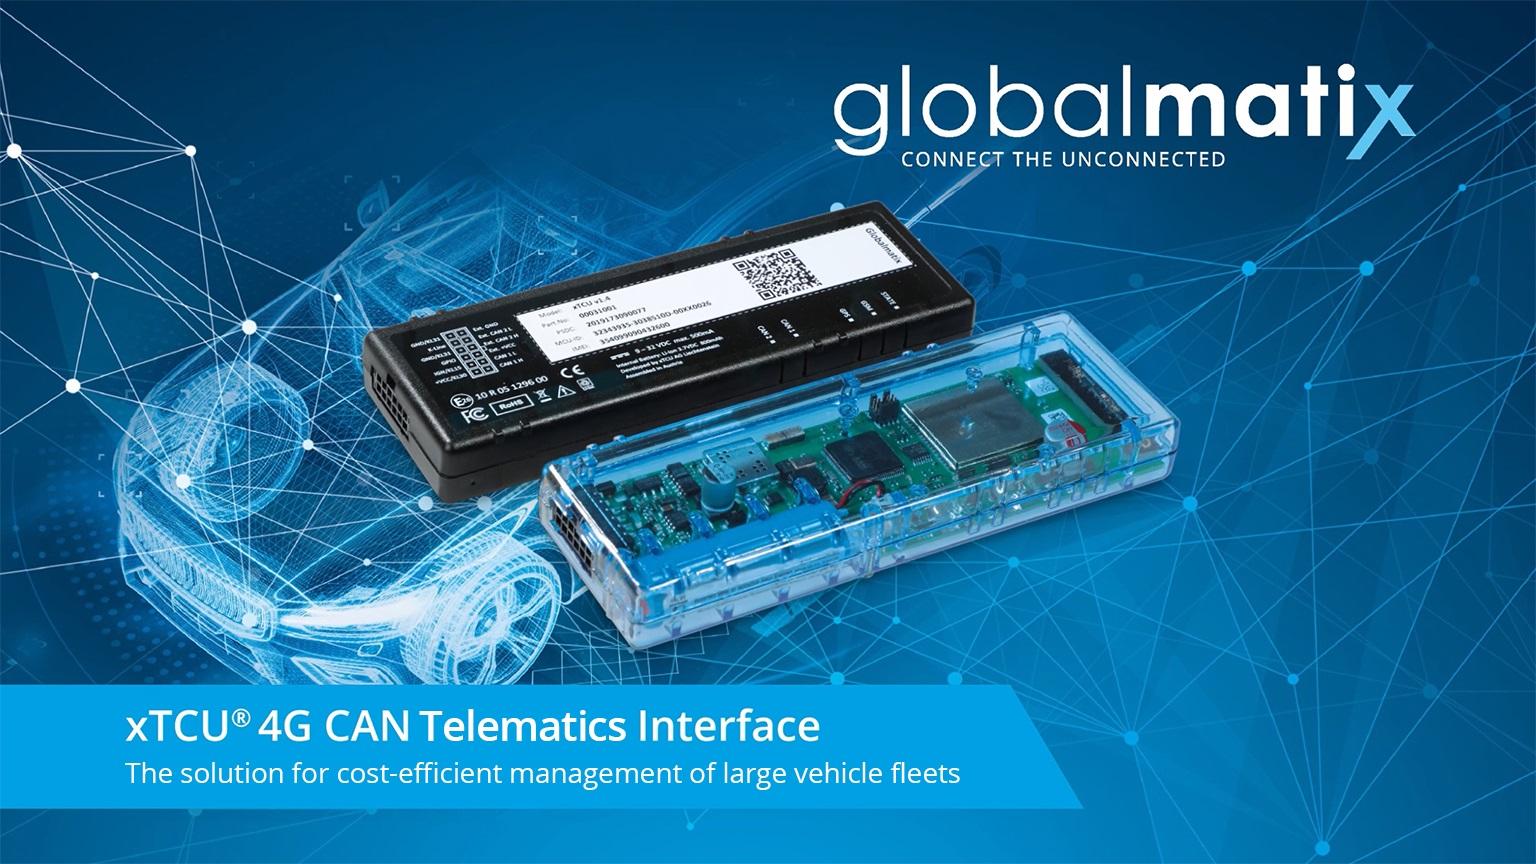 GlobalmatiX Telematics Solution for xTCU Telematics Interface – the New Dimension...